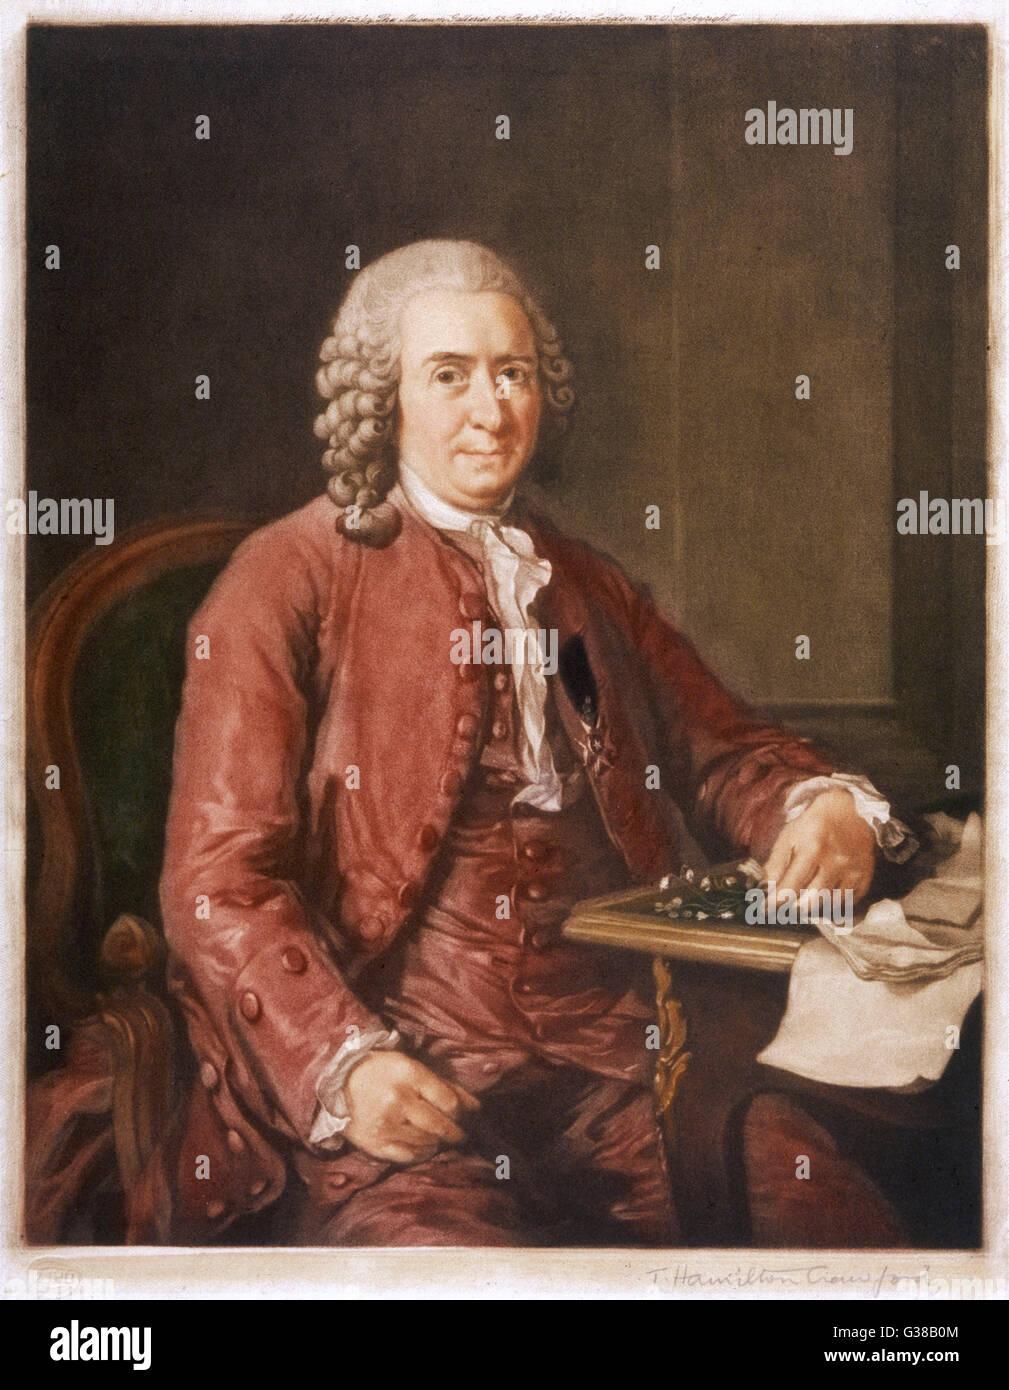 CARL VON LINNE known as LINNAEUS  Swedish naturalist and  botanist.      Date: 1707-1778 Stock Photo